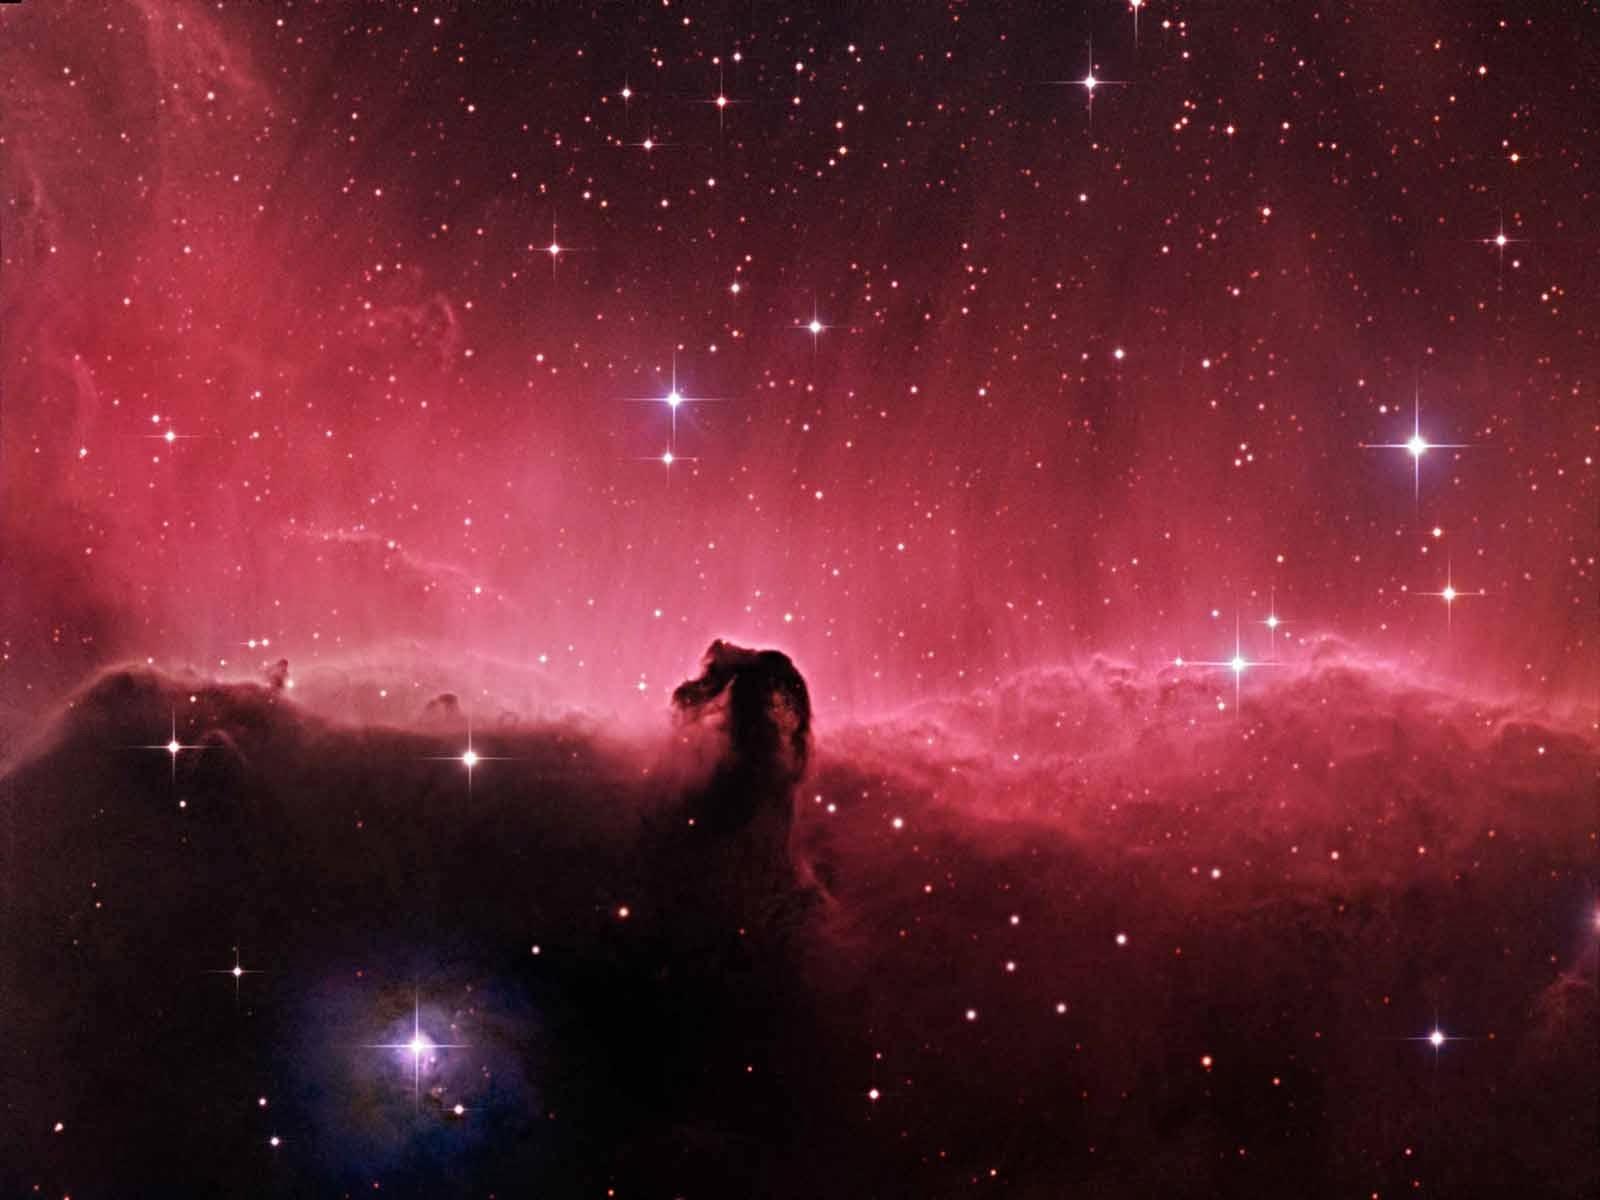 Horsehead Nebula Wallpapers 1600x1200